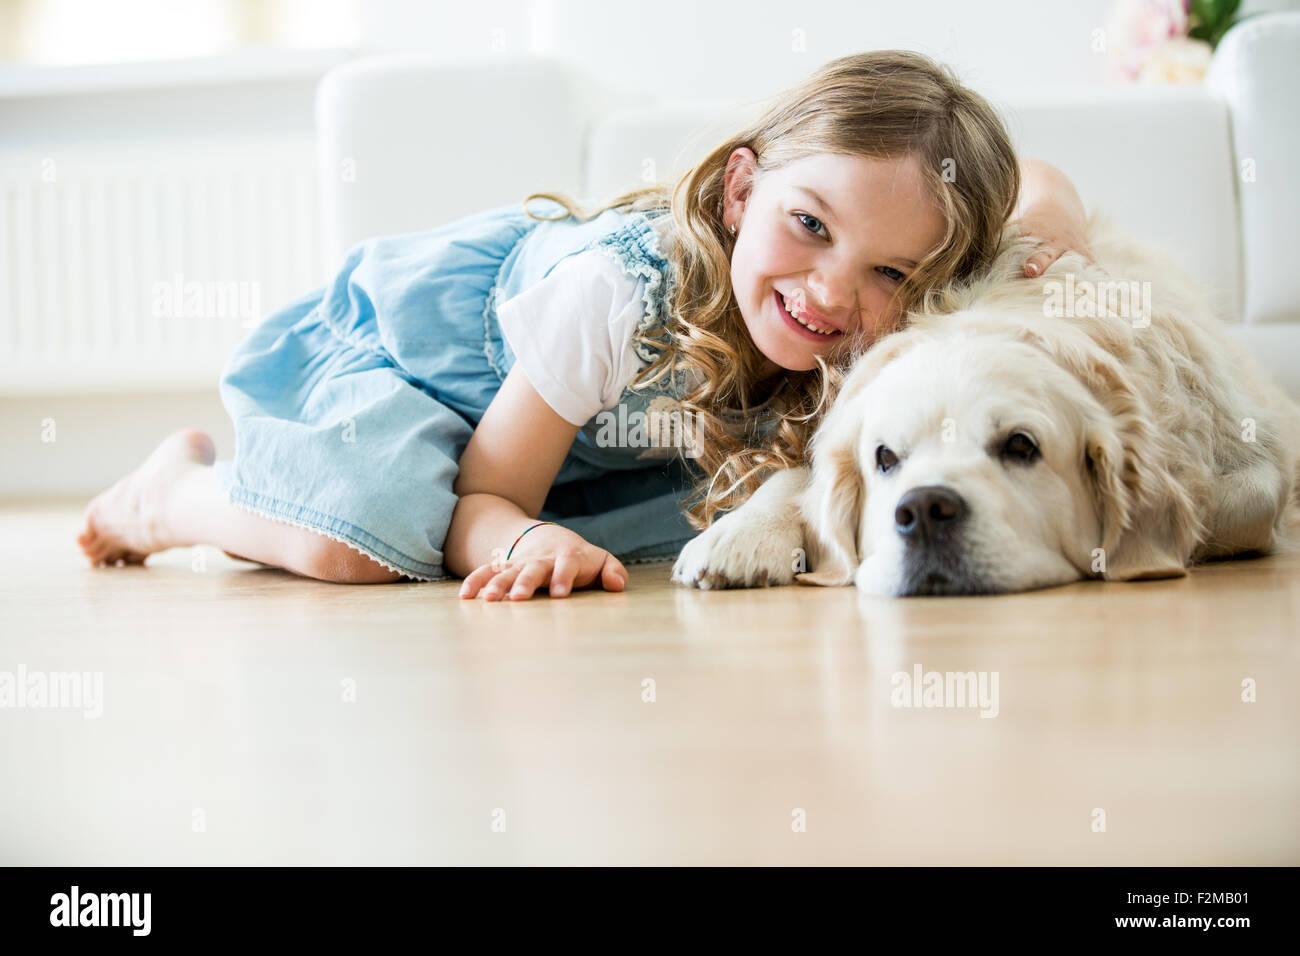 Little girl cuddling with her dog, lying on floor - Stock Image